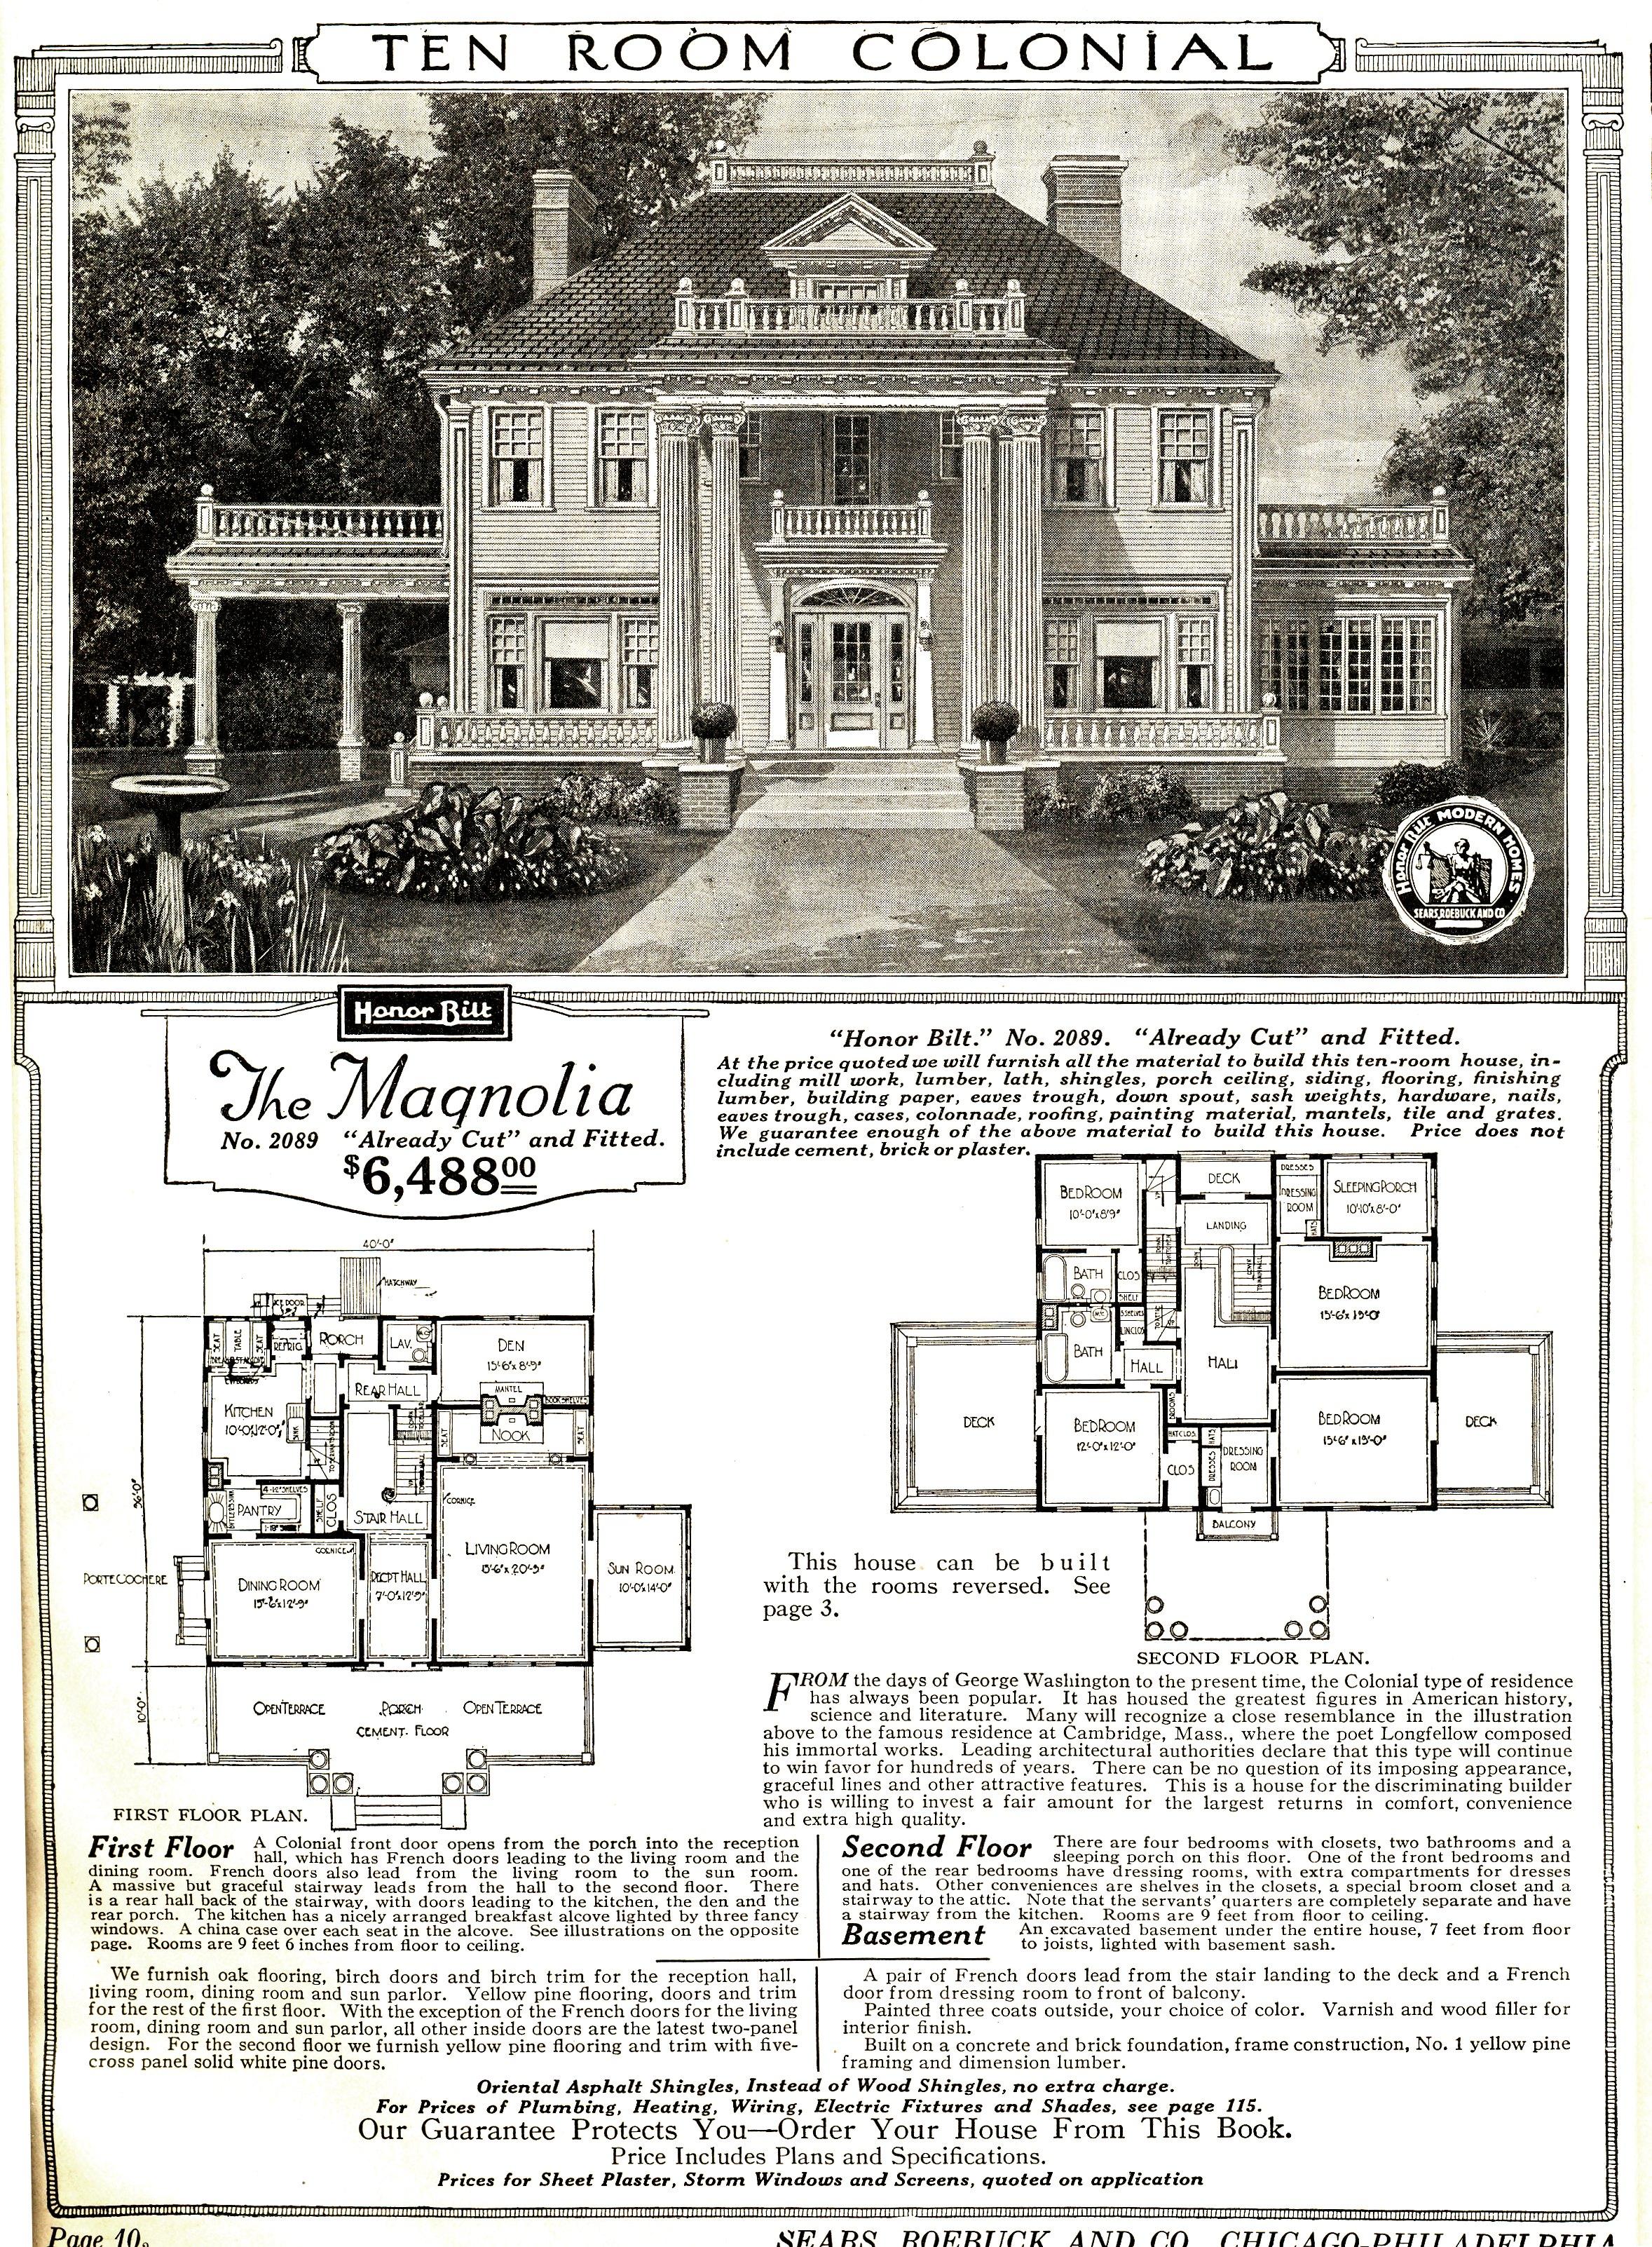 By Sears Modern Homes(Life time: 1921) - Original publication: 1921 Sears Modern Homes CatalogImmediate source: Original publication, PD-US-expired,